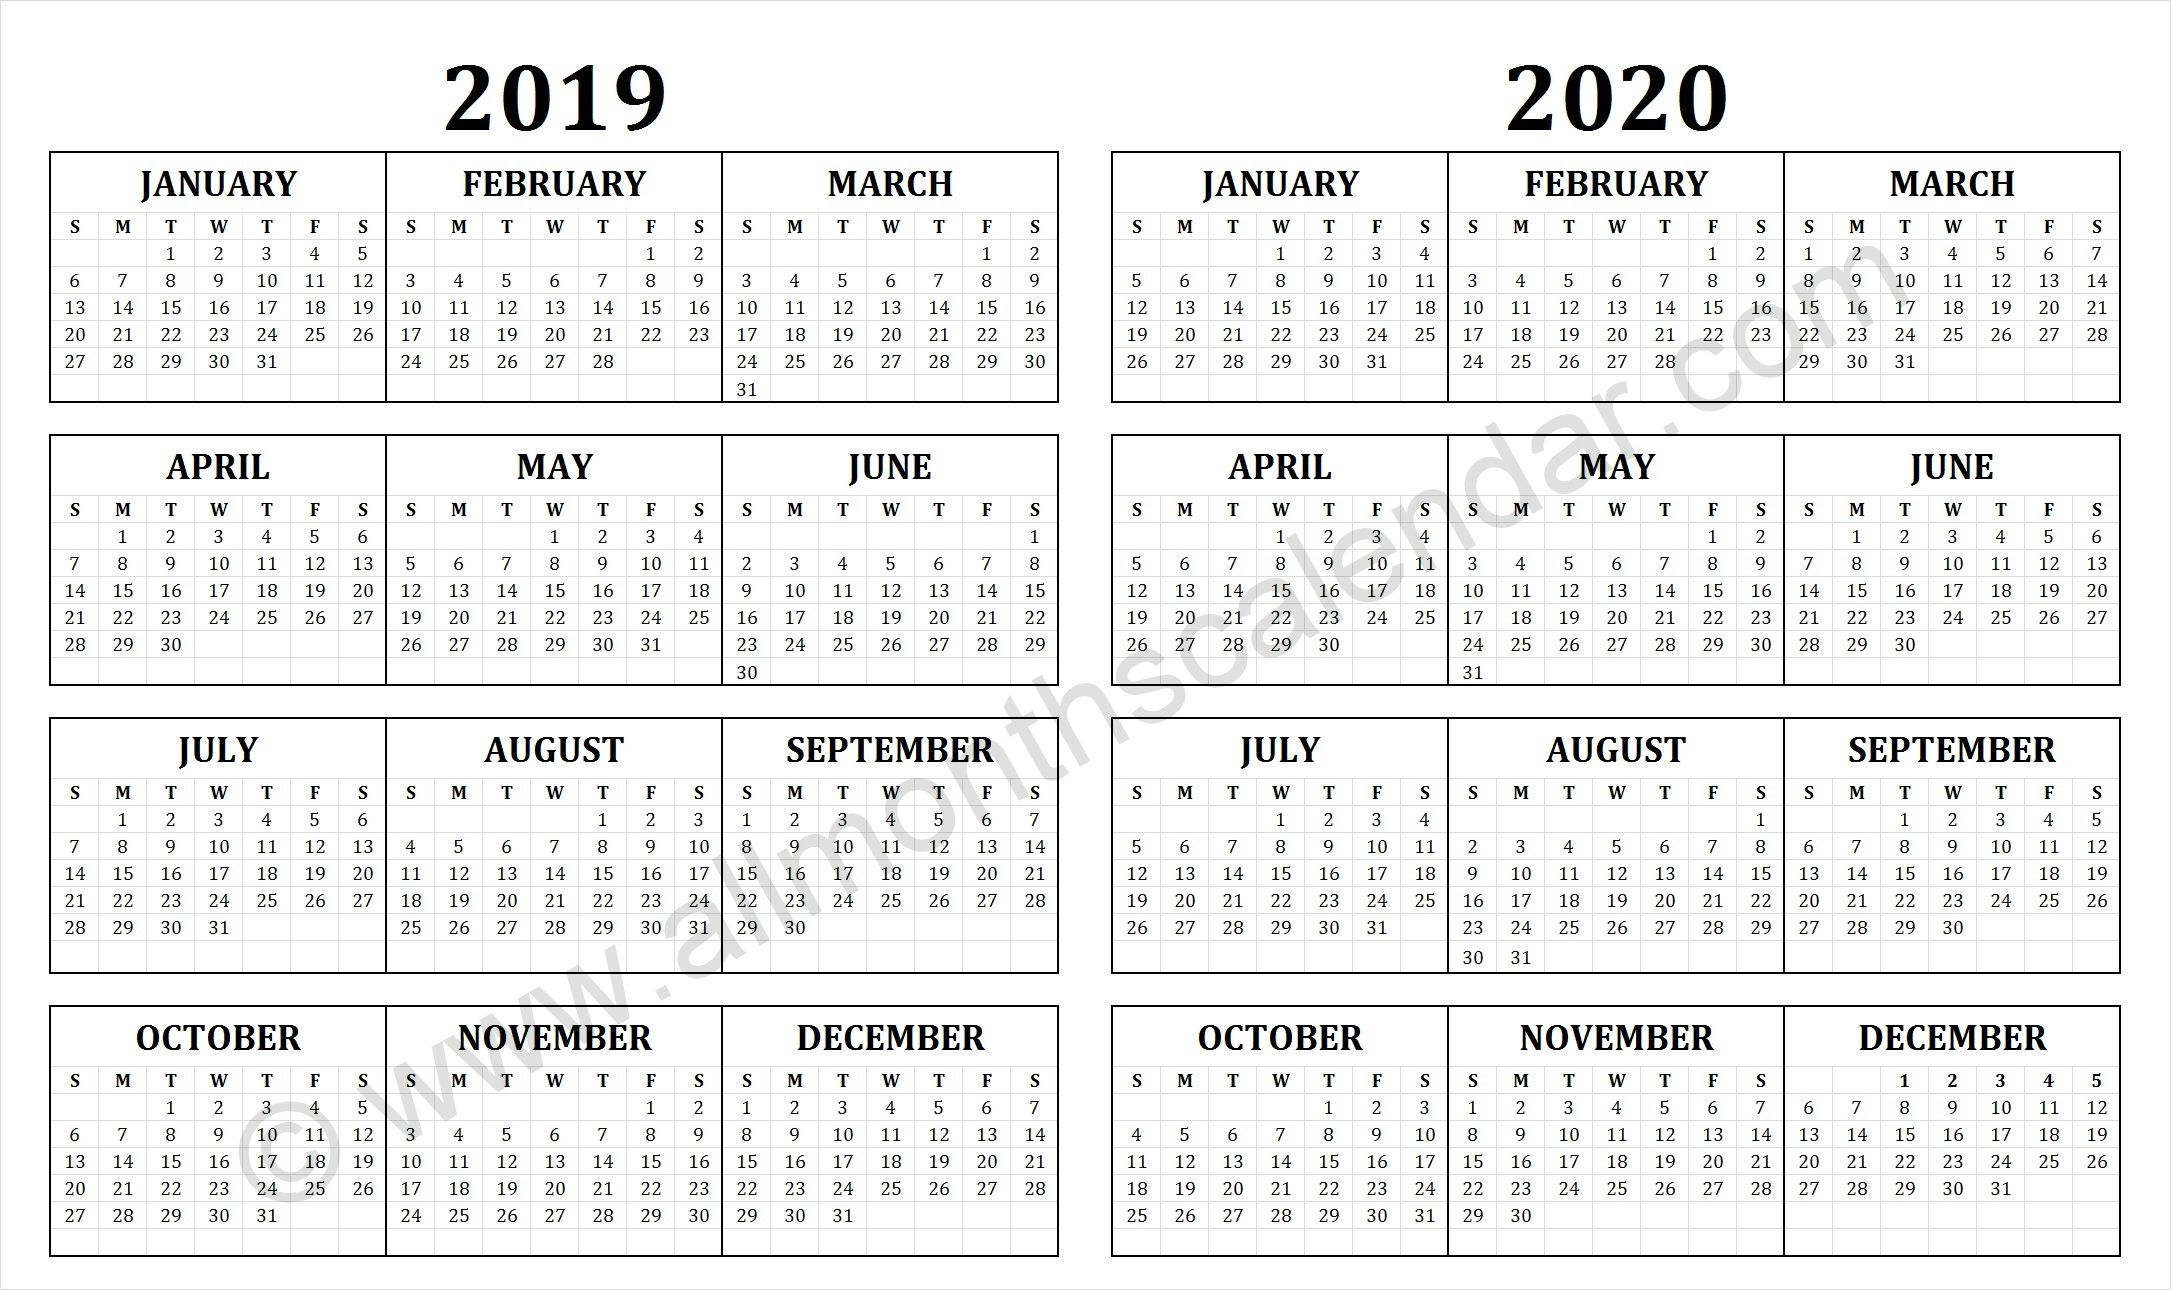 2019 And 2020 Calendar | Free Printable Calendar Templates intended for Quadax Julian Date Calendar 2020